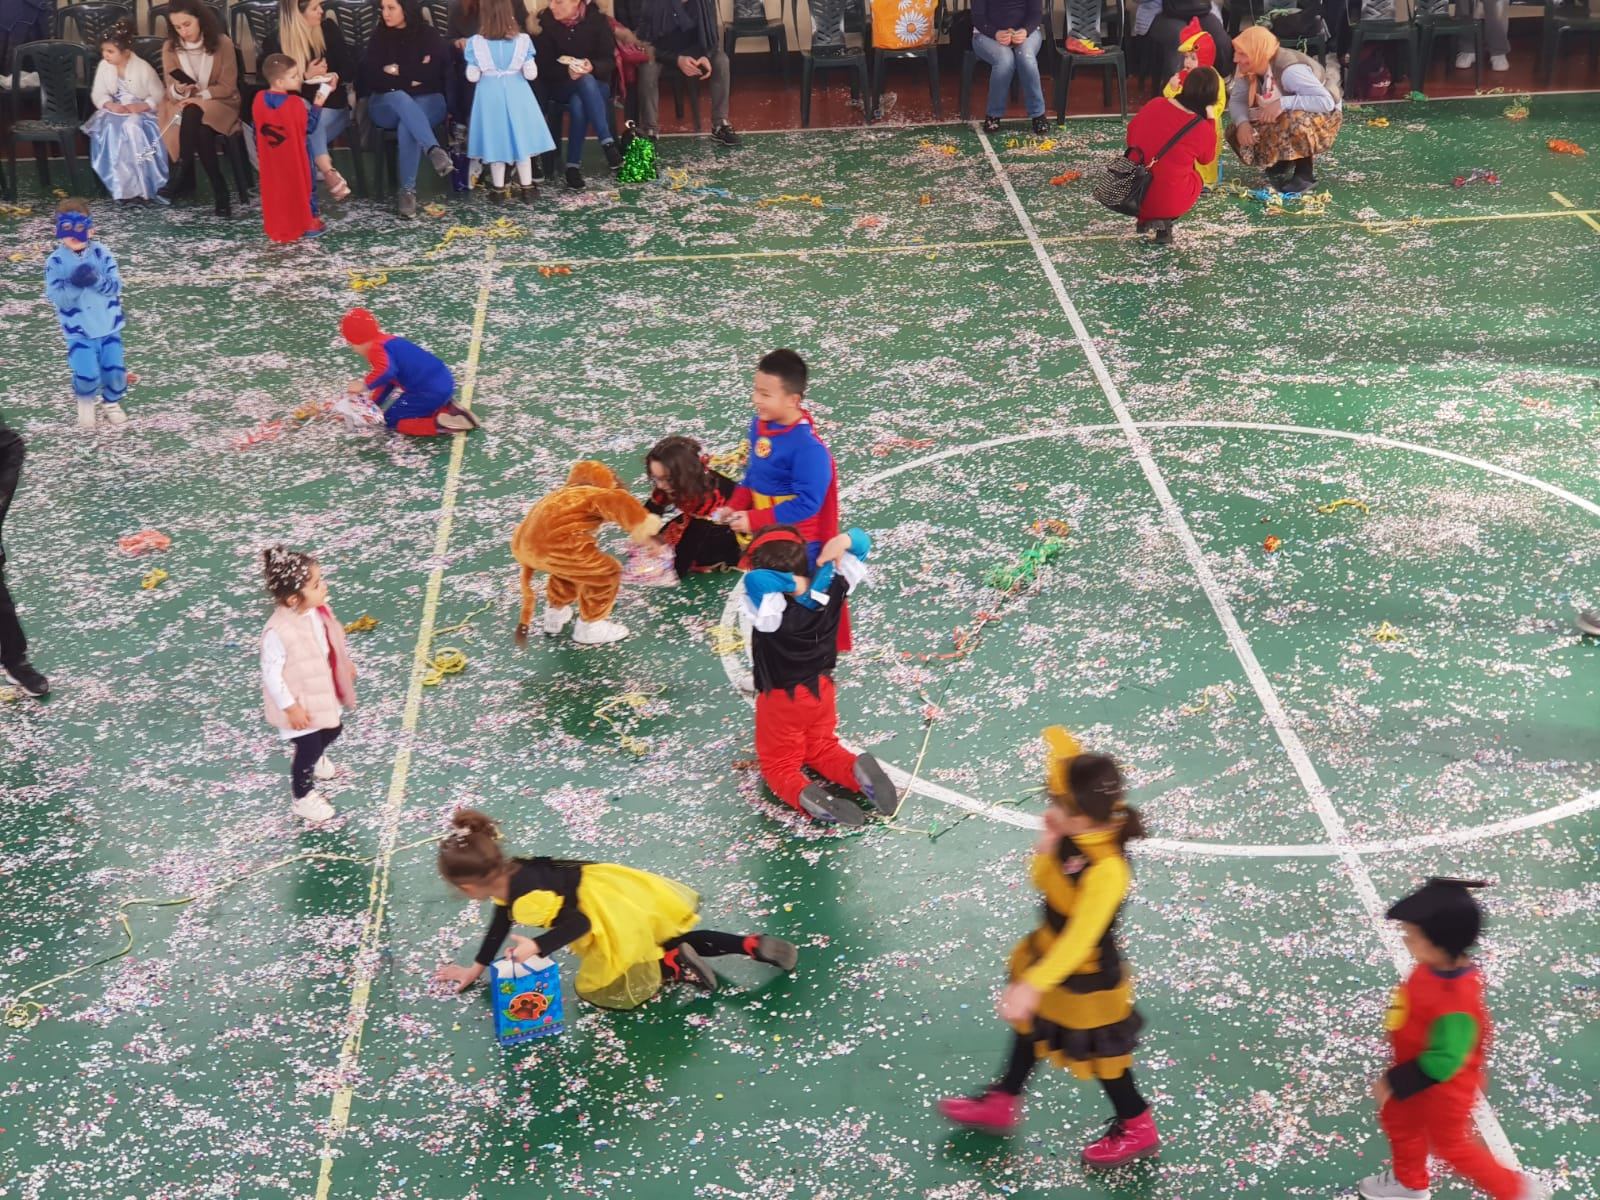 Baraonda Carnevale 2019 (35)